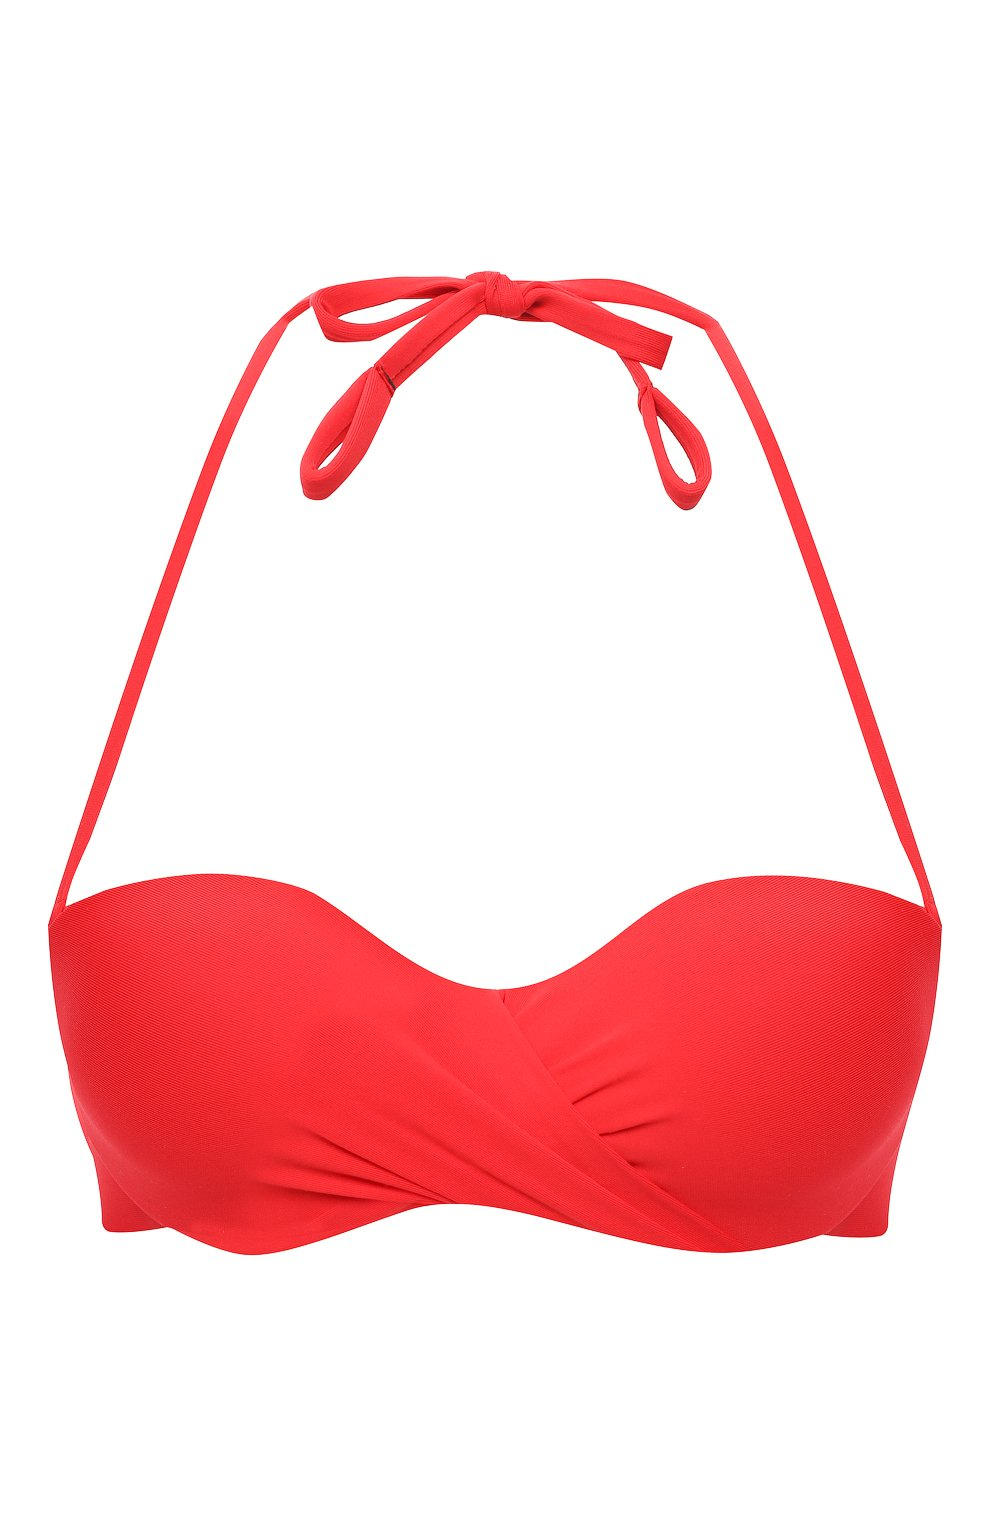 Женский бра-бандо RITRATTI MILANO красного цвета, арт. 71981 | Фото 1